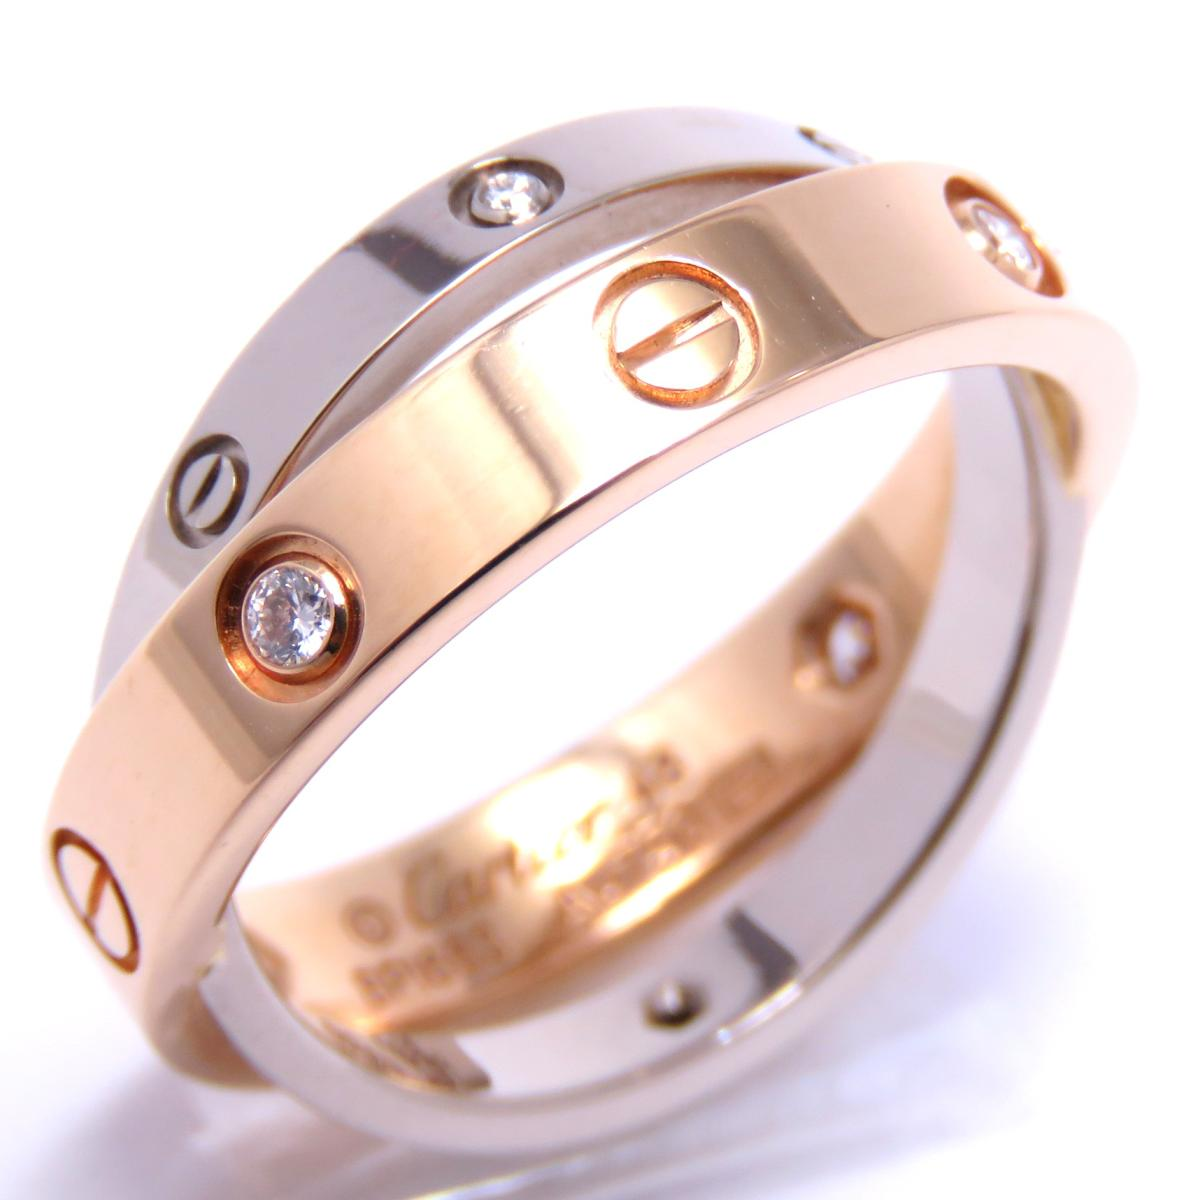 Cartier(カルティエ)/ビーラブリング 6Pダイヤ 指輪 リング/リング//K18PG(750)ピンクゴールド×K18WG(750)ホワイトゴールド/【ランクA】/#48/8.5号【中古】